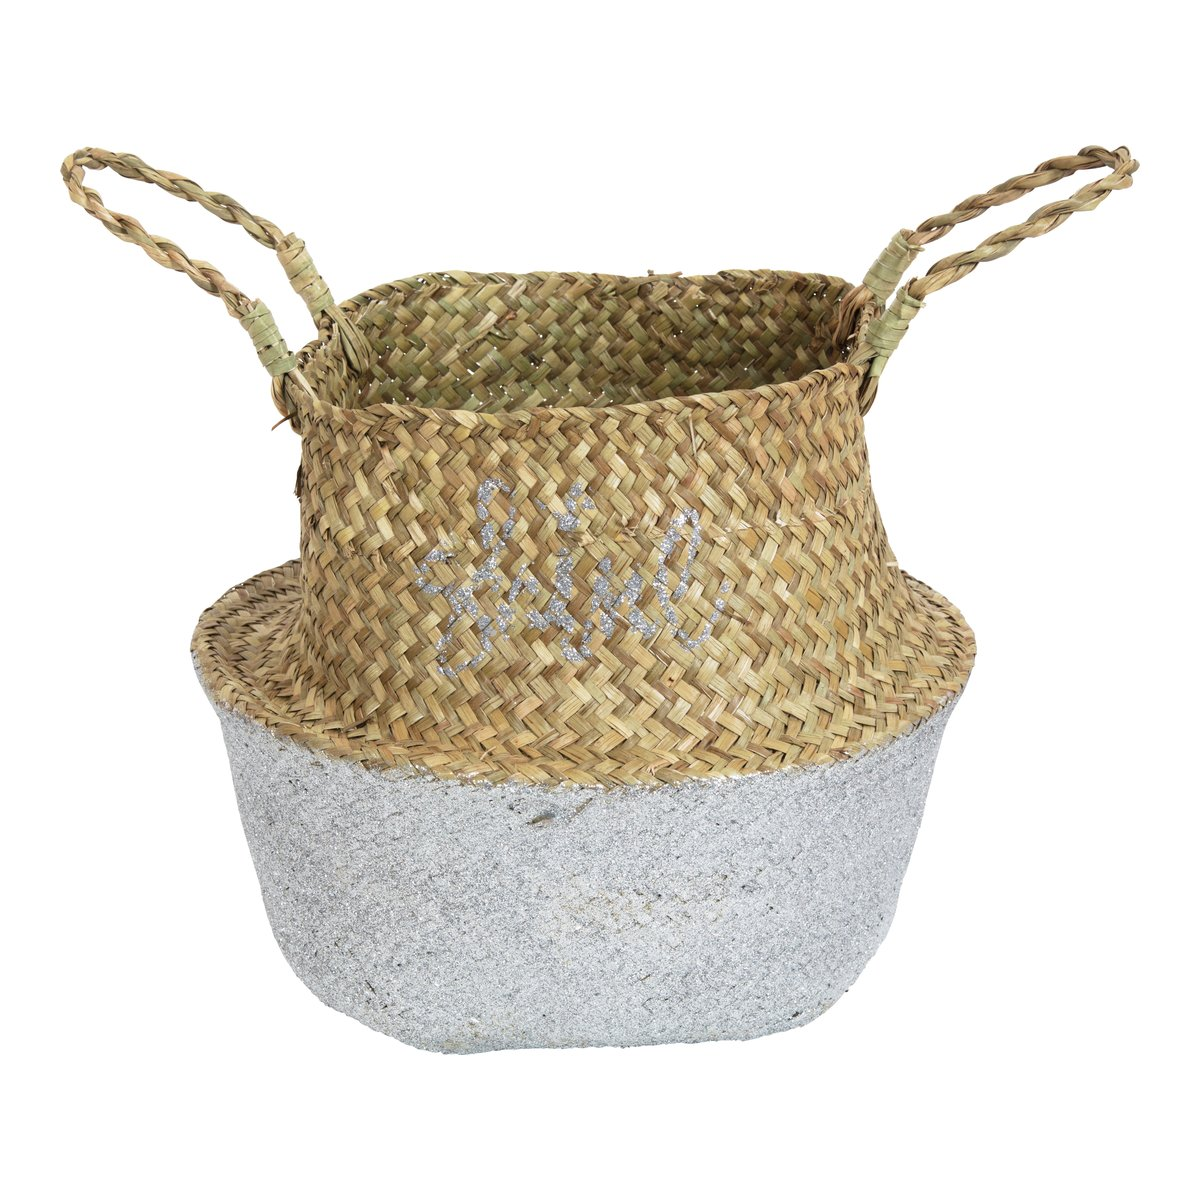 Stråkurv shine silver-KUR3051